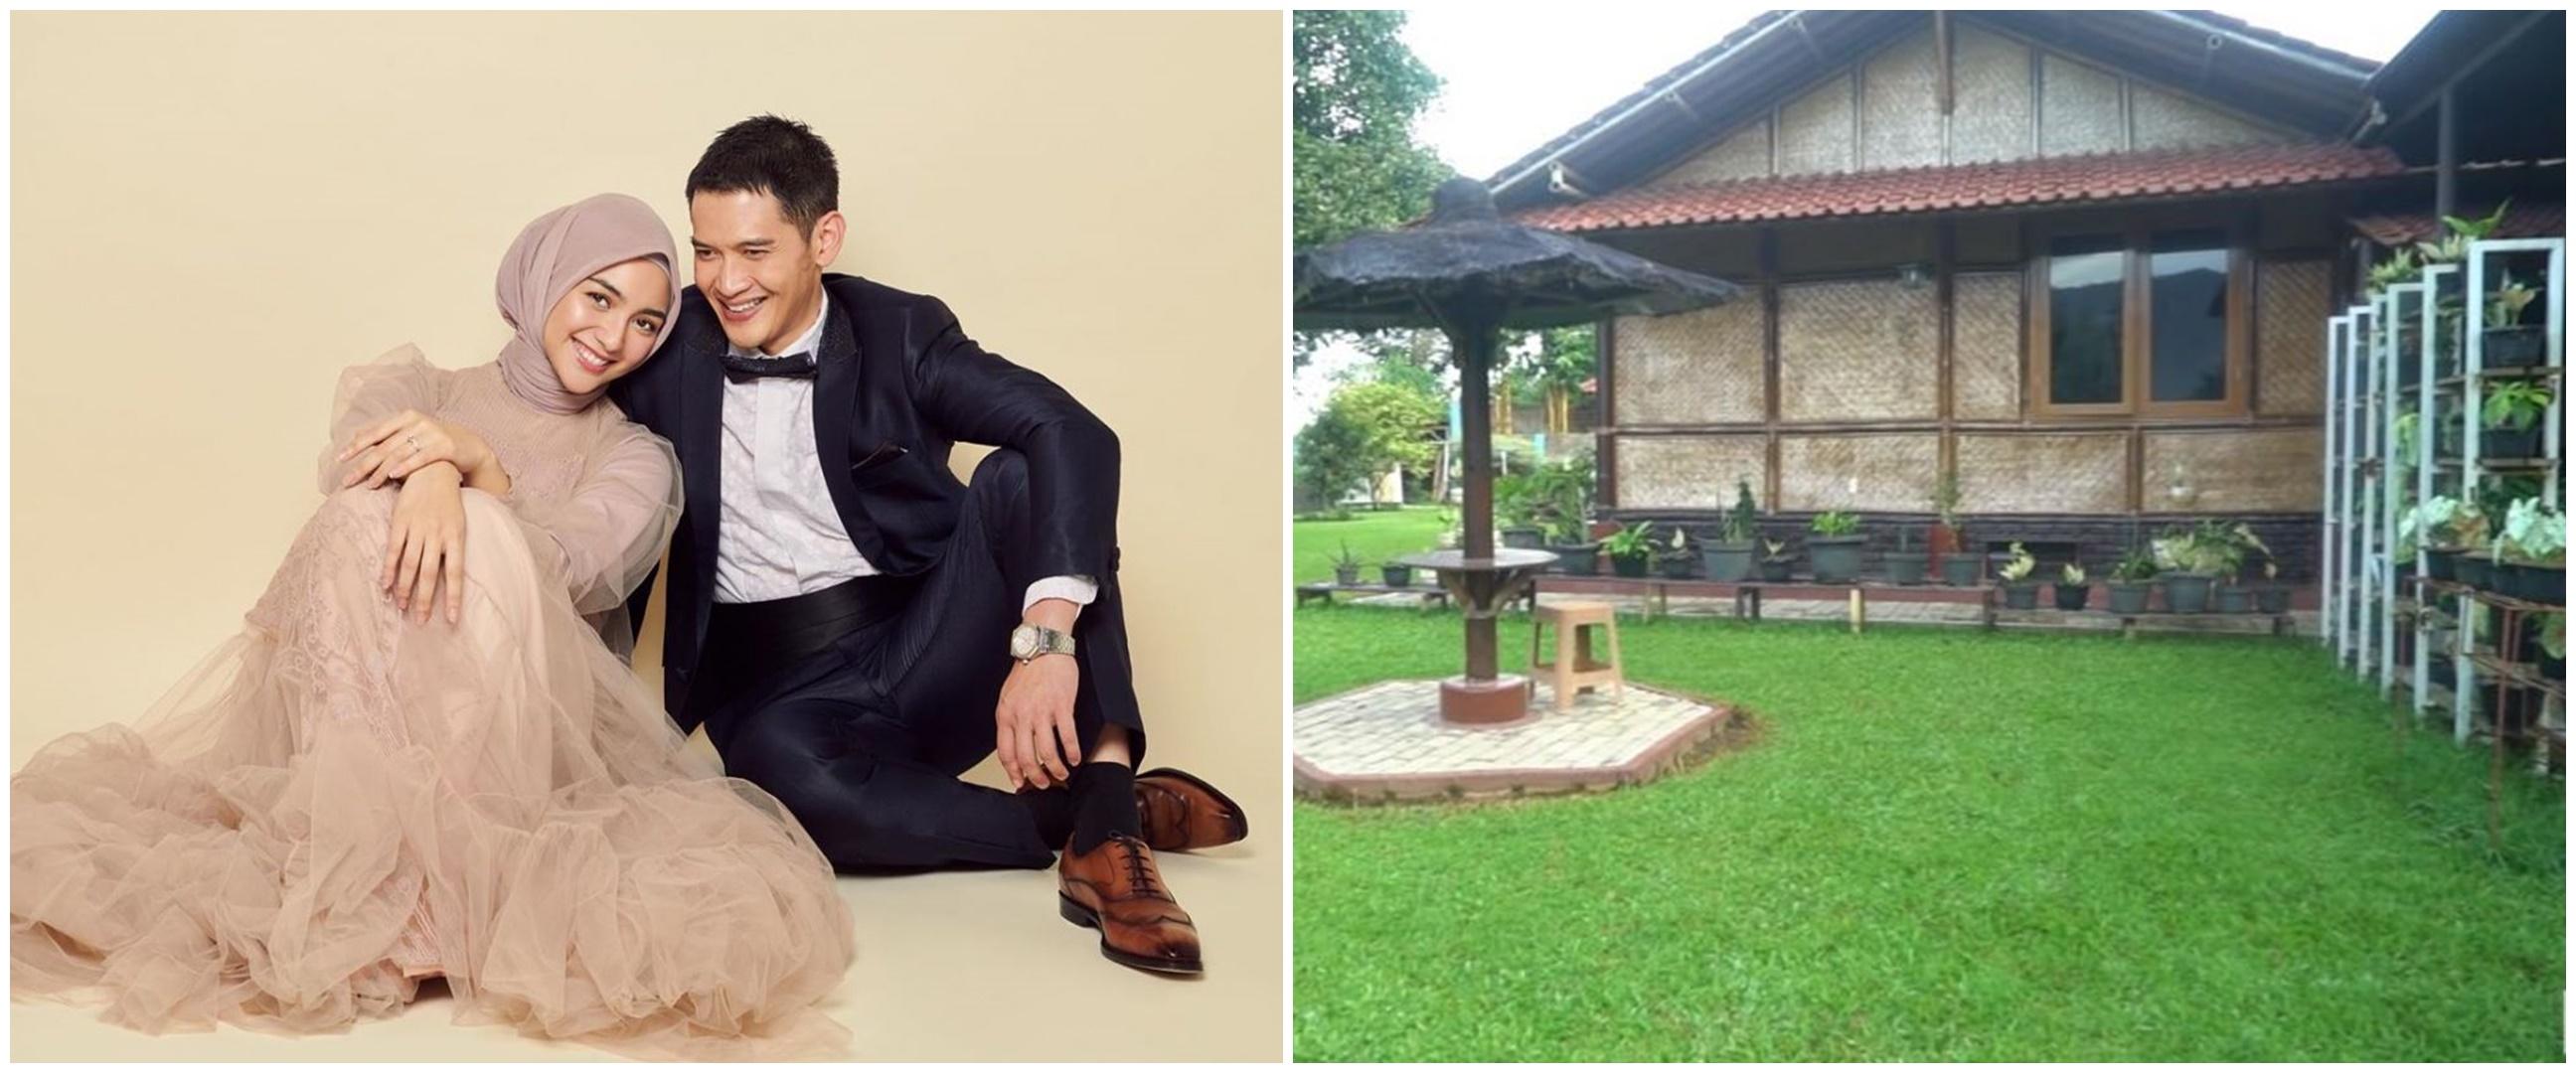 Potret vila 8 pesinetron Tanah Air, punya Citra Kirana saung bambu